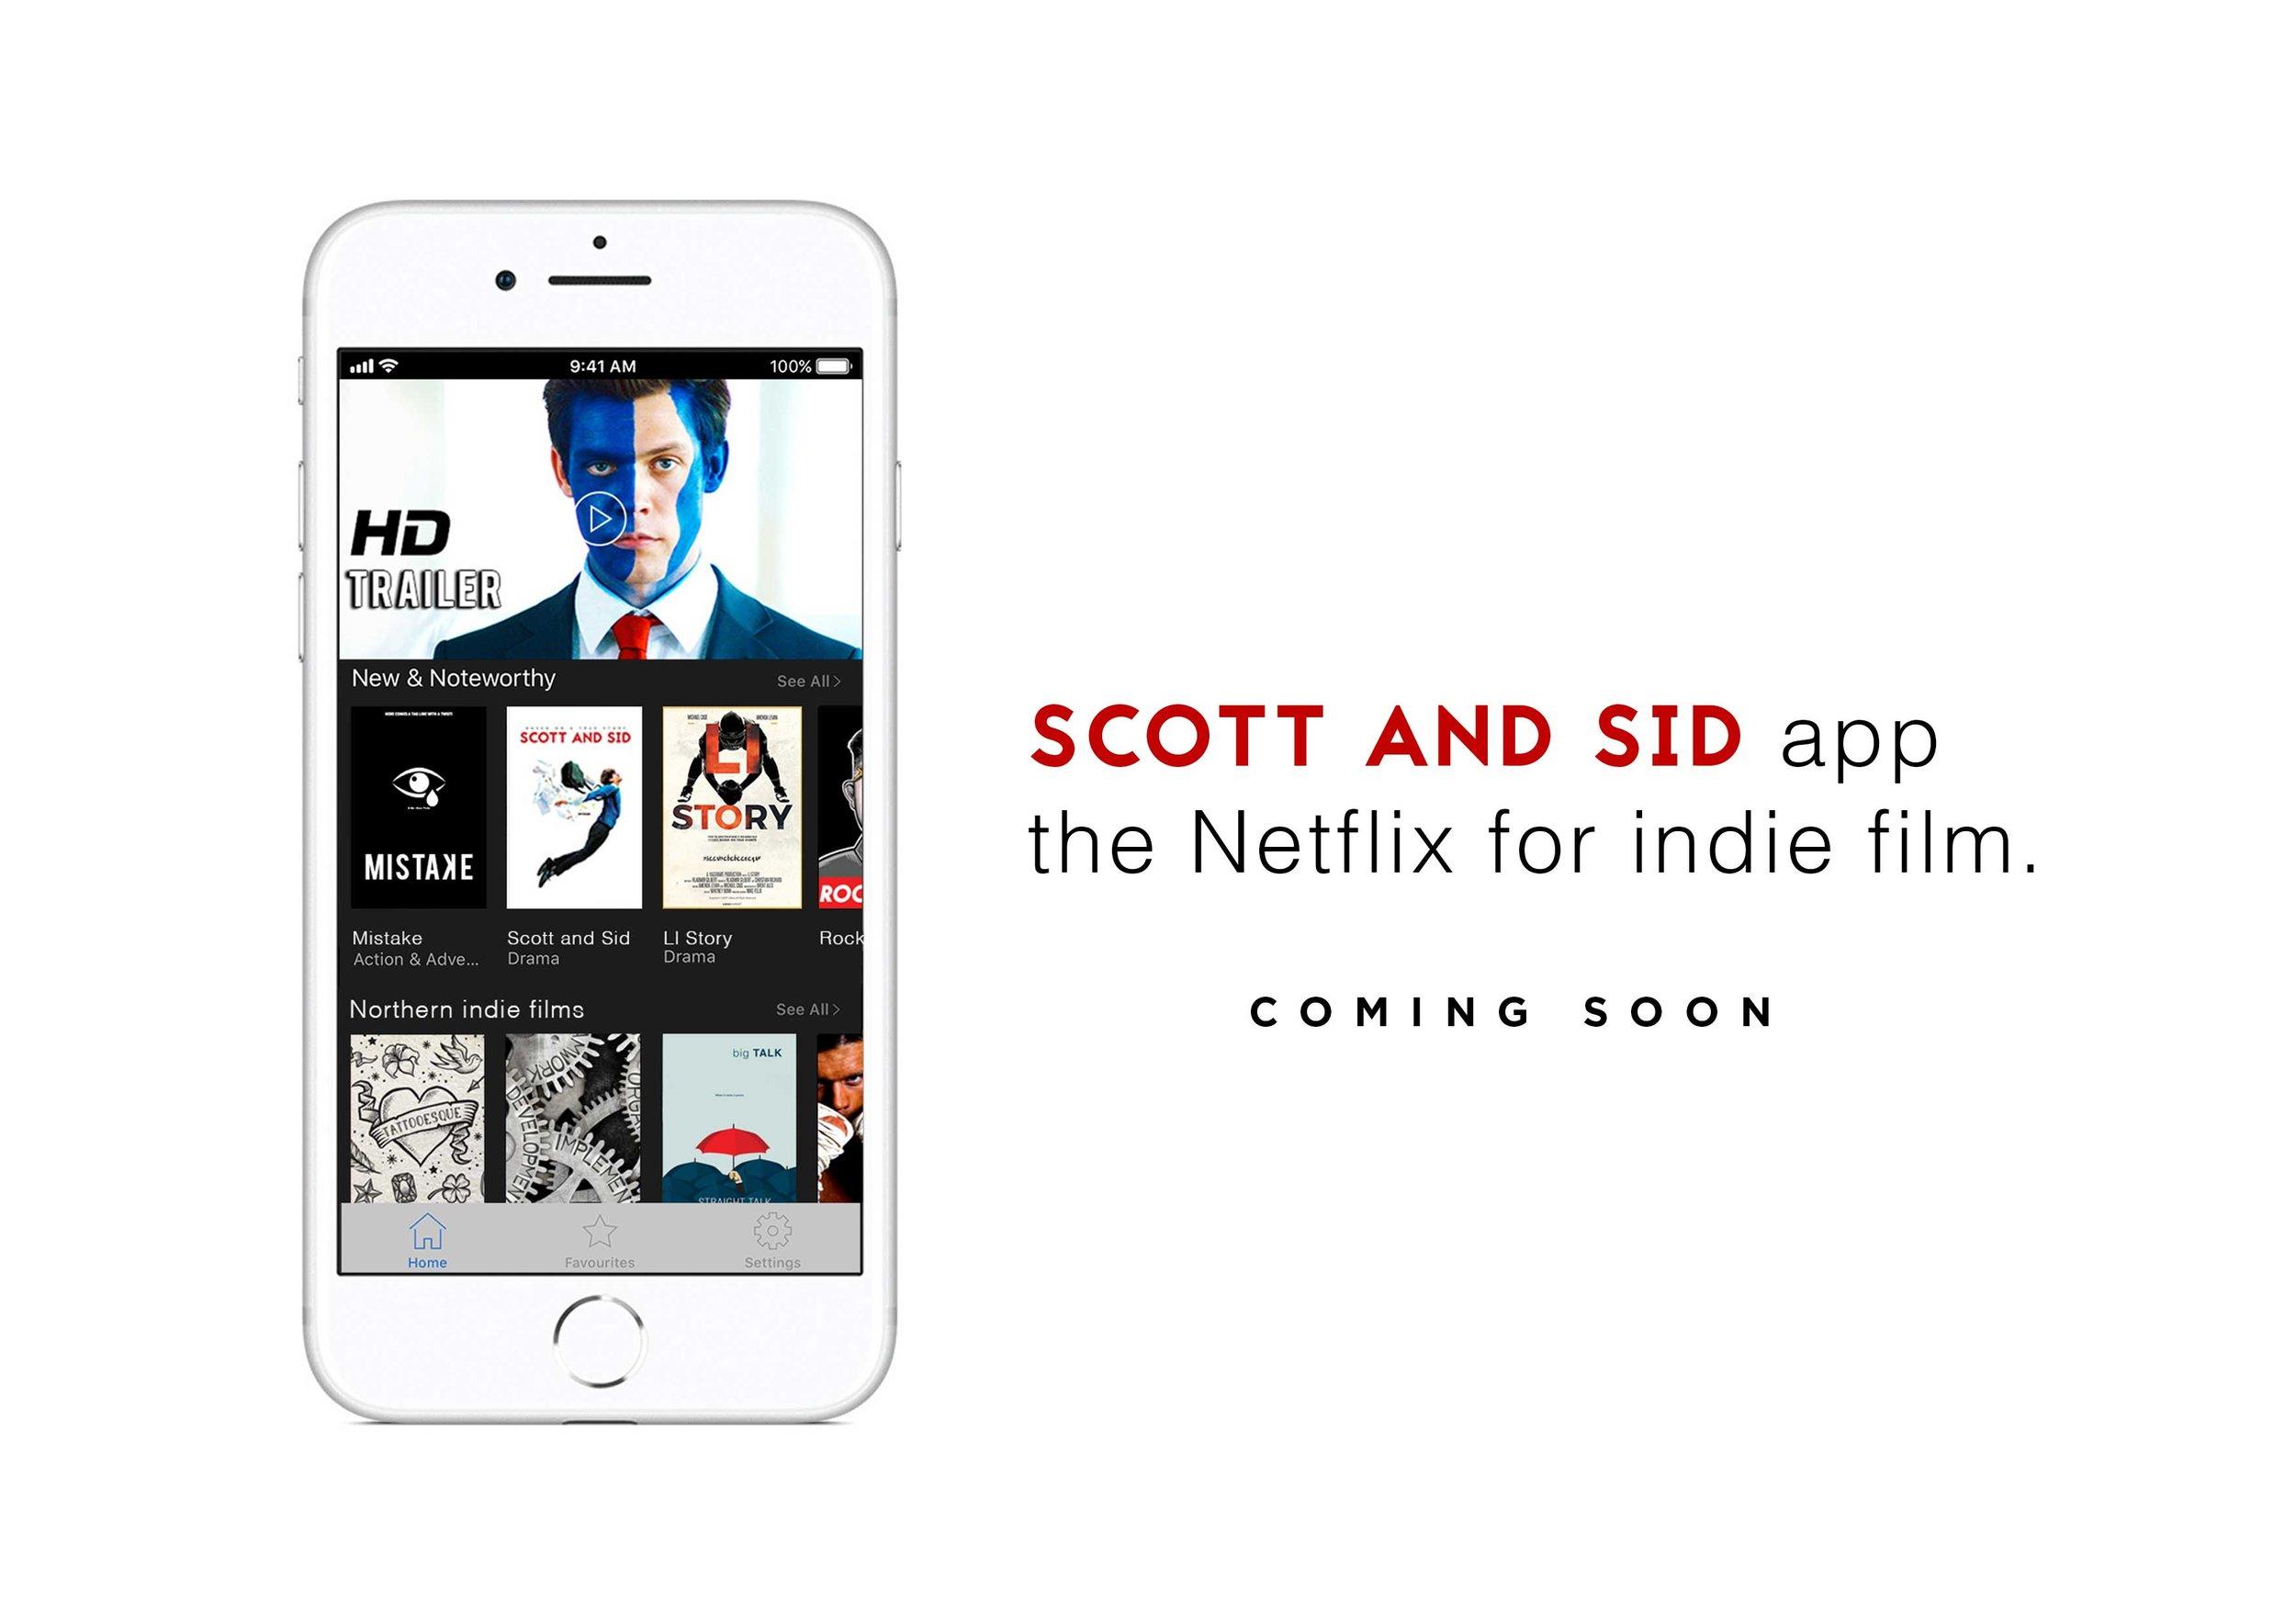 scottandsid-the-netflix-for-indie-film.jpg